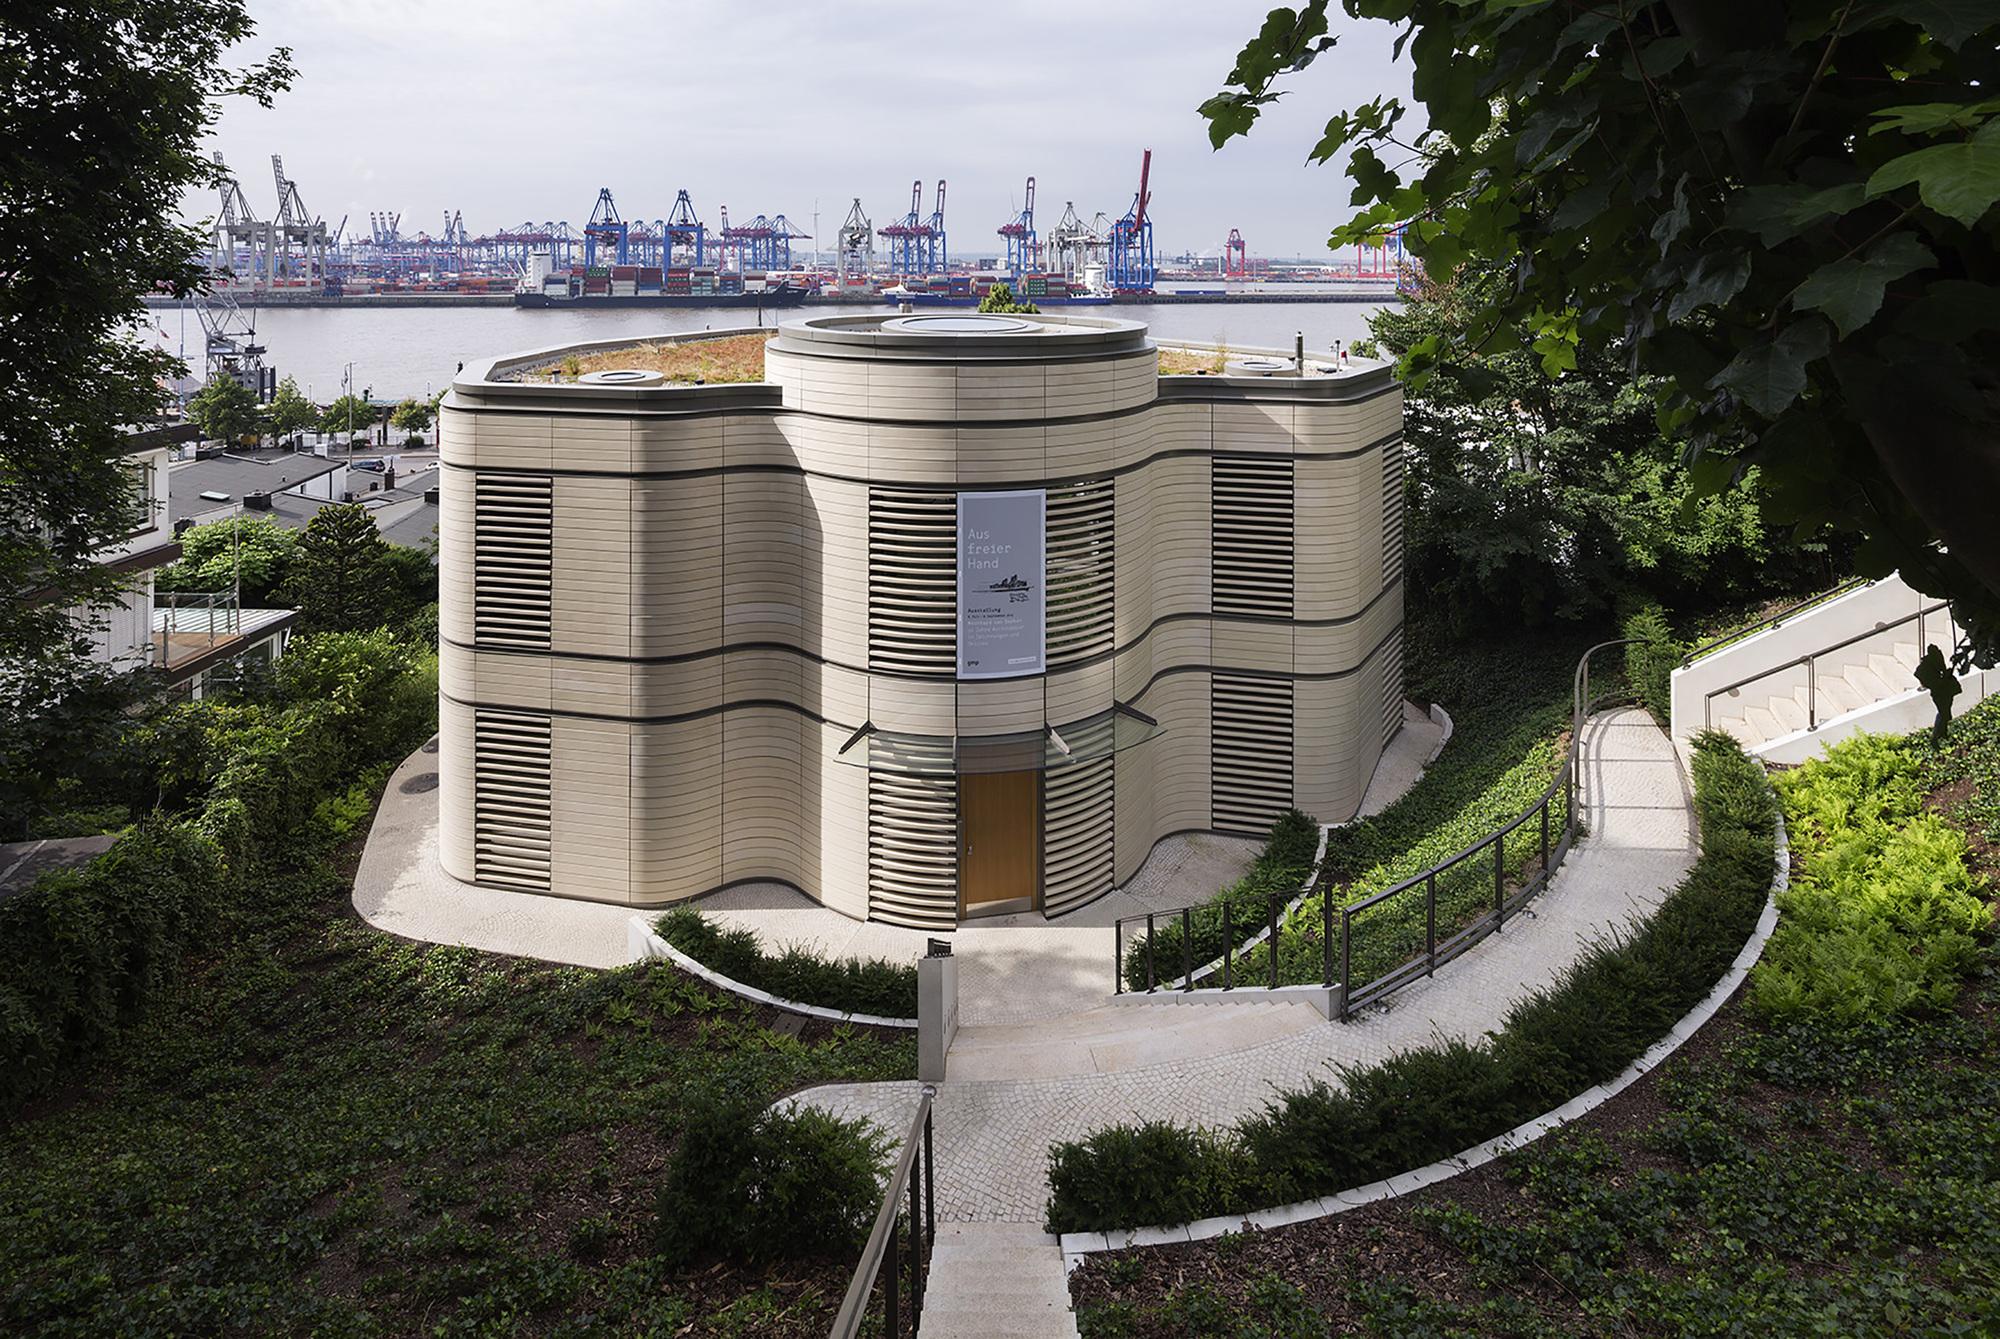 Architecture pavilion gmp architekten archdaily - Gmp architektur ...